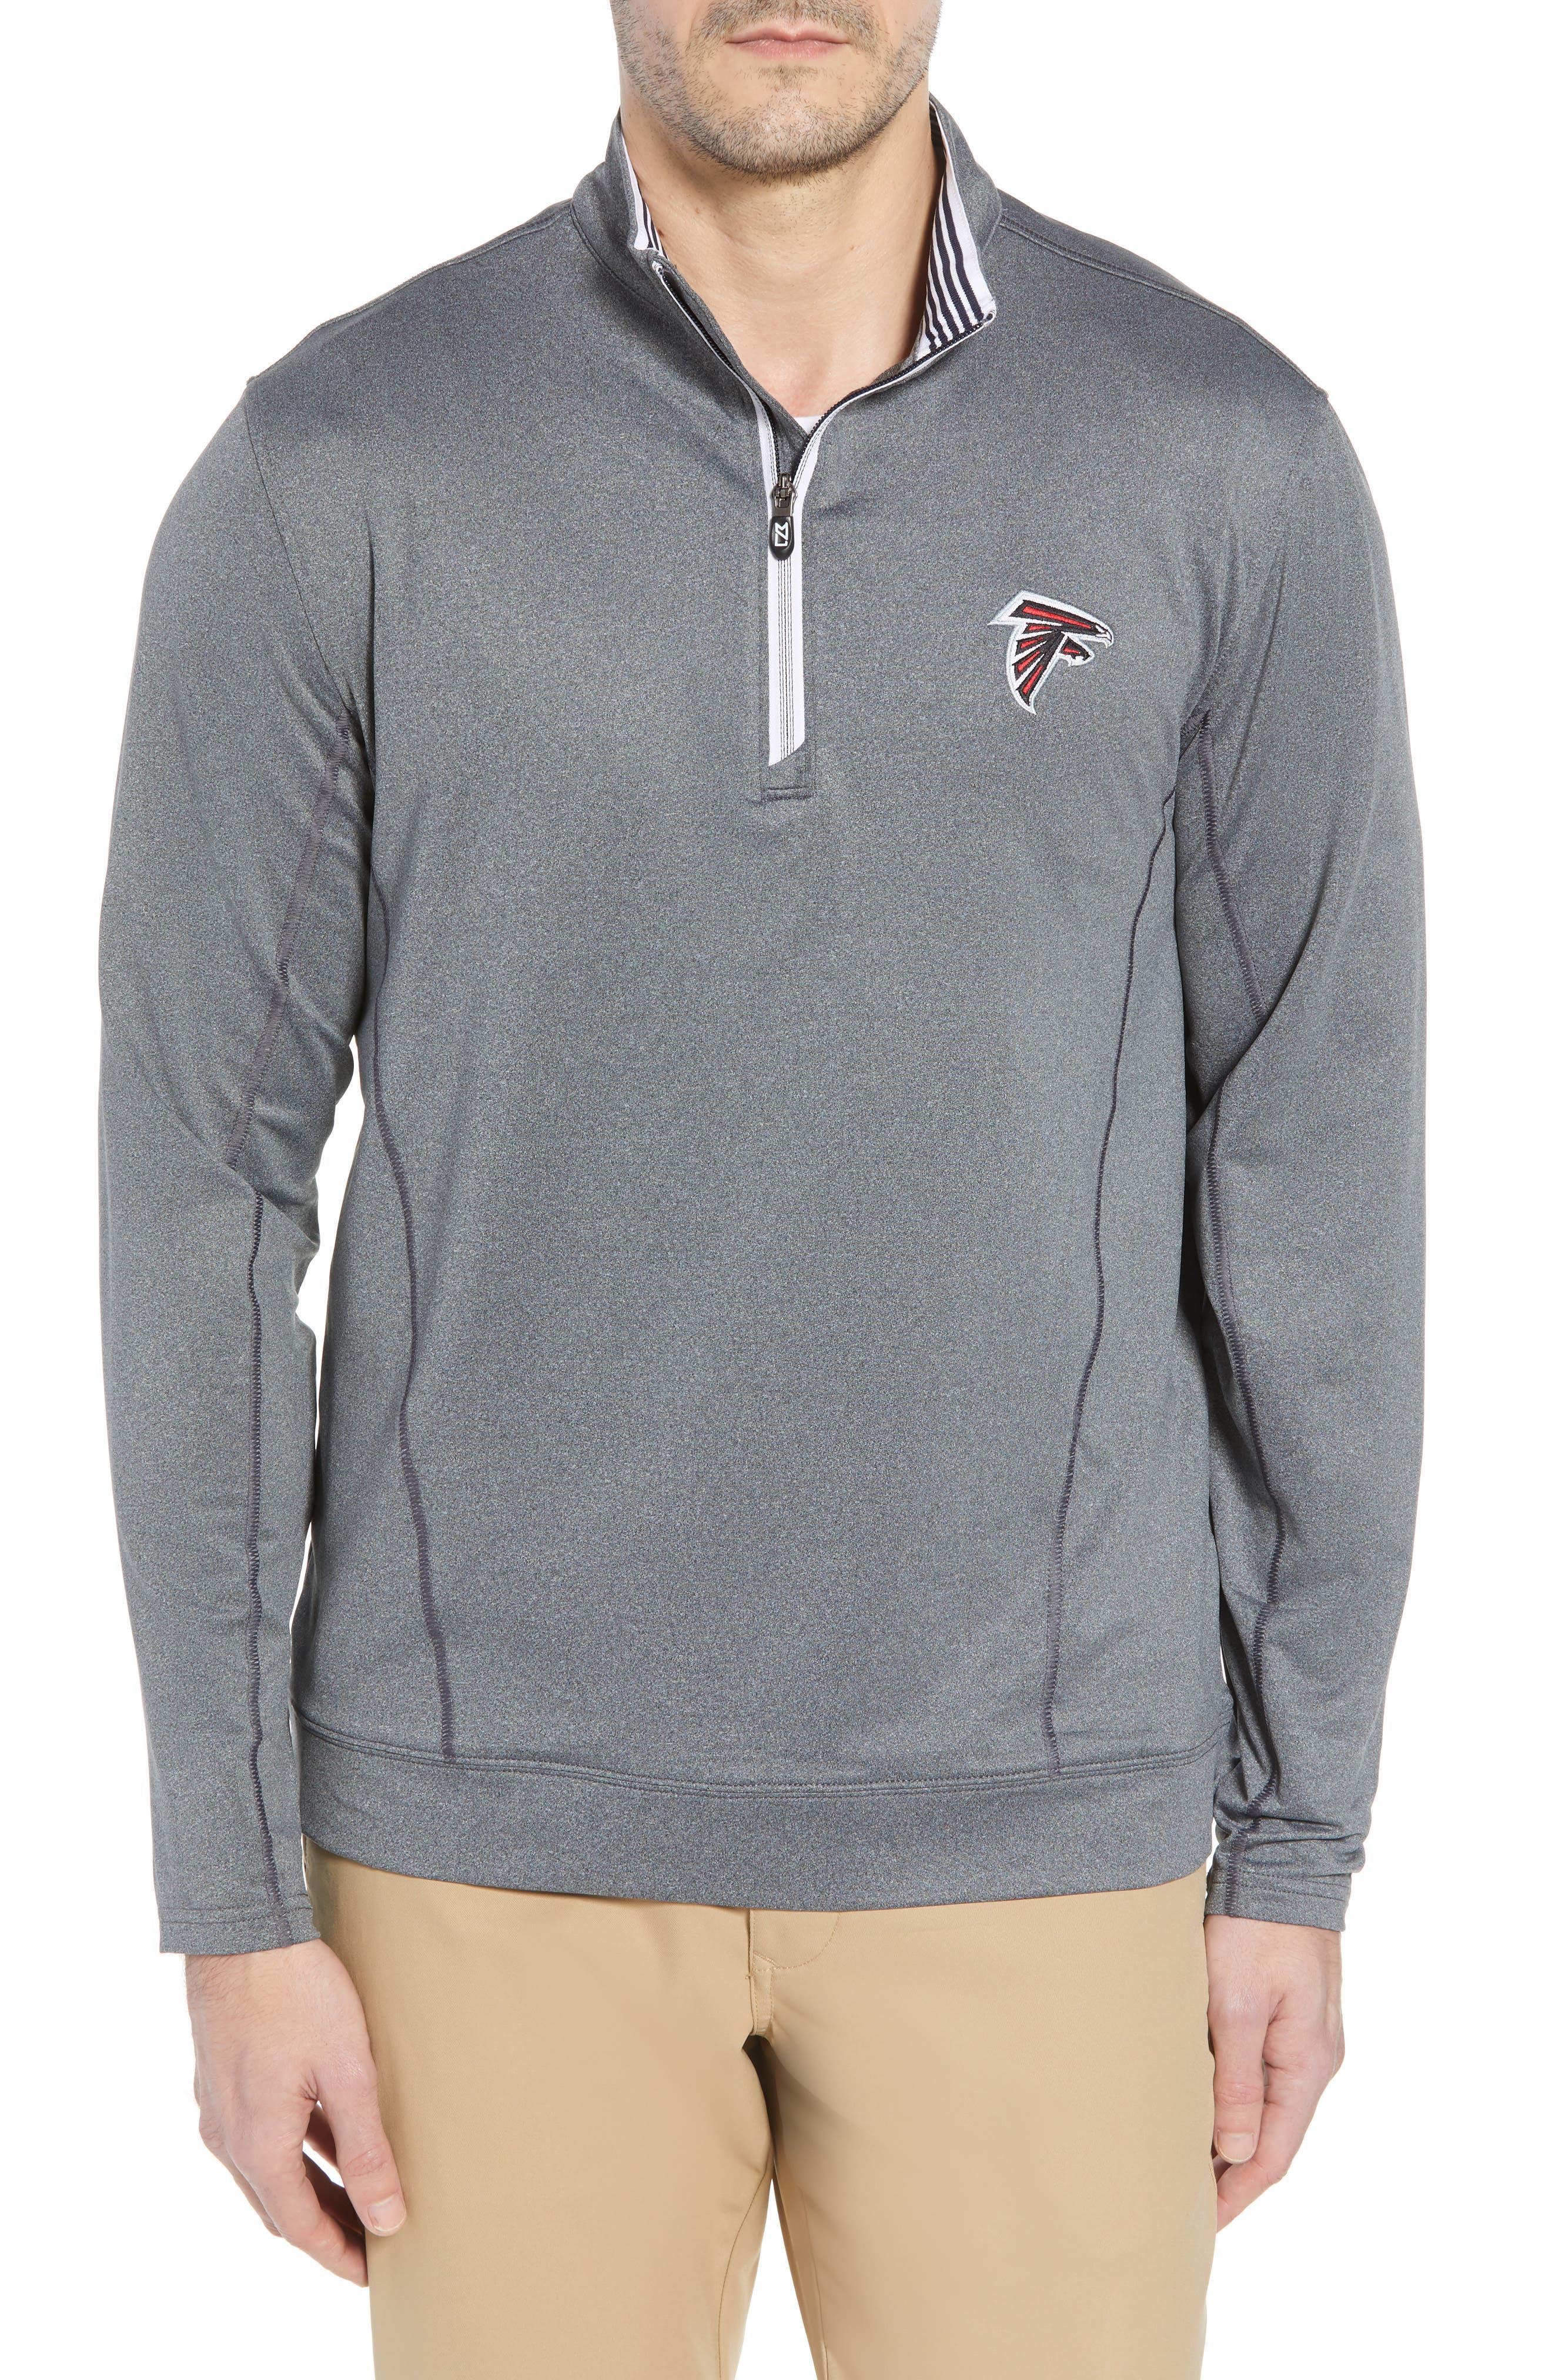 Endurance Atlanta Falcons Regular Fit Pullover,                         Main,                         color, CHARCOAL HEATHER